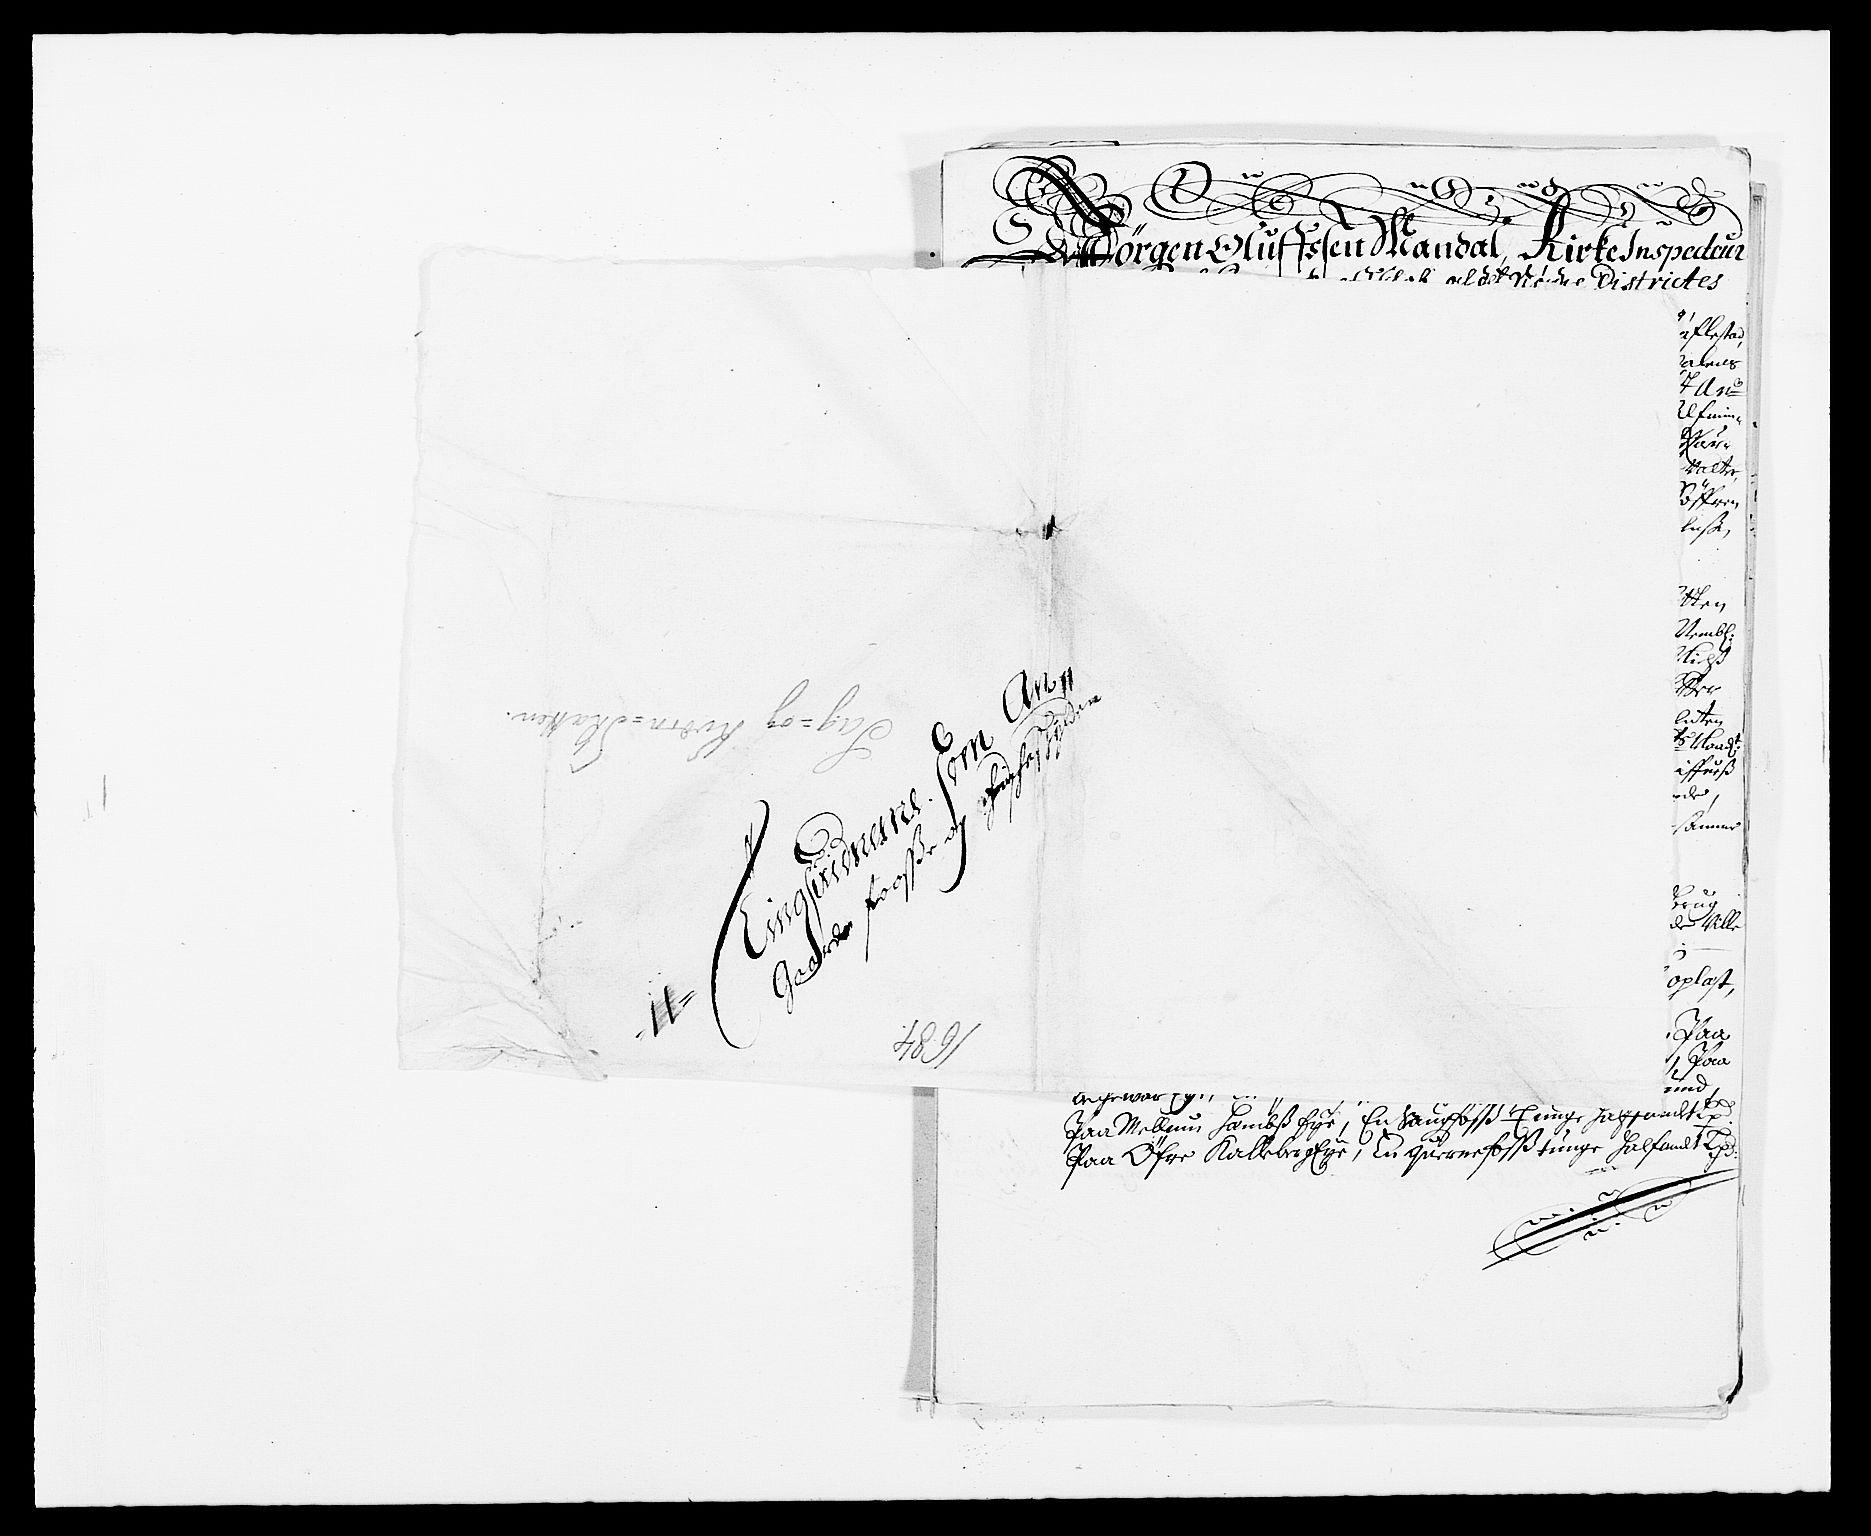 RA, Rentekammeret inntil 1814, Reviderte regnskaper, Fogderegnskap, R32/L1855: Fogderegnskap Jarlsberg grevskap, 1684, s. 187